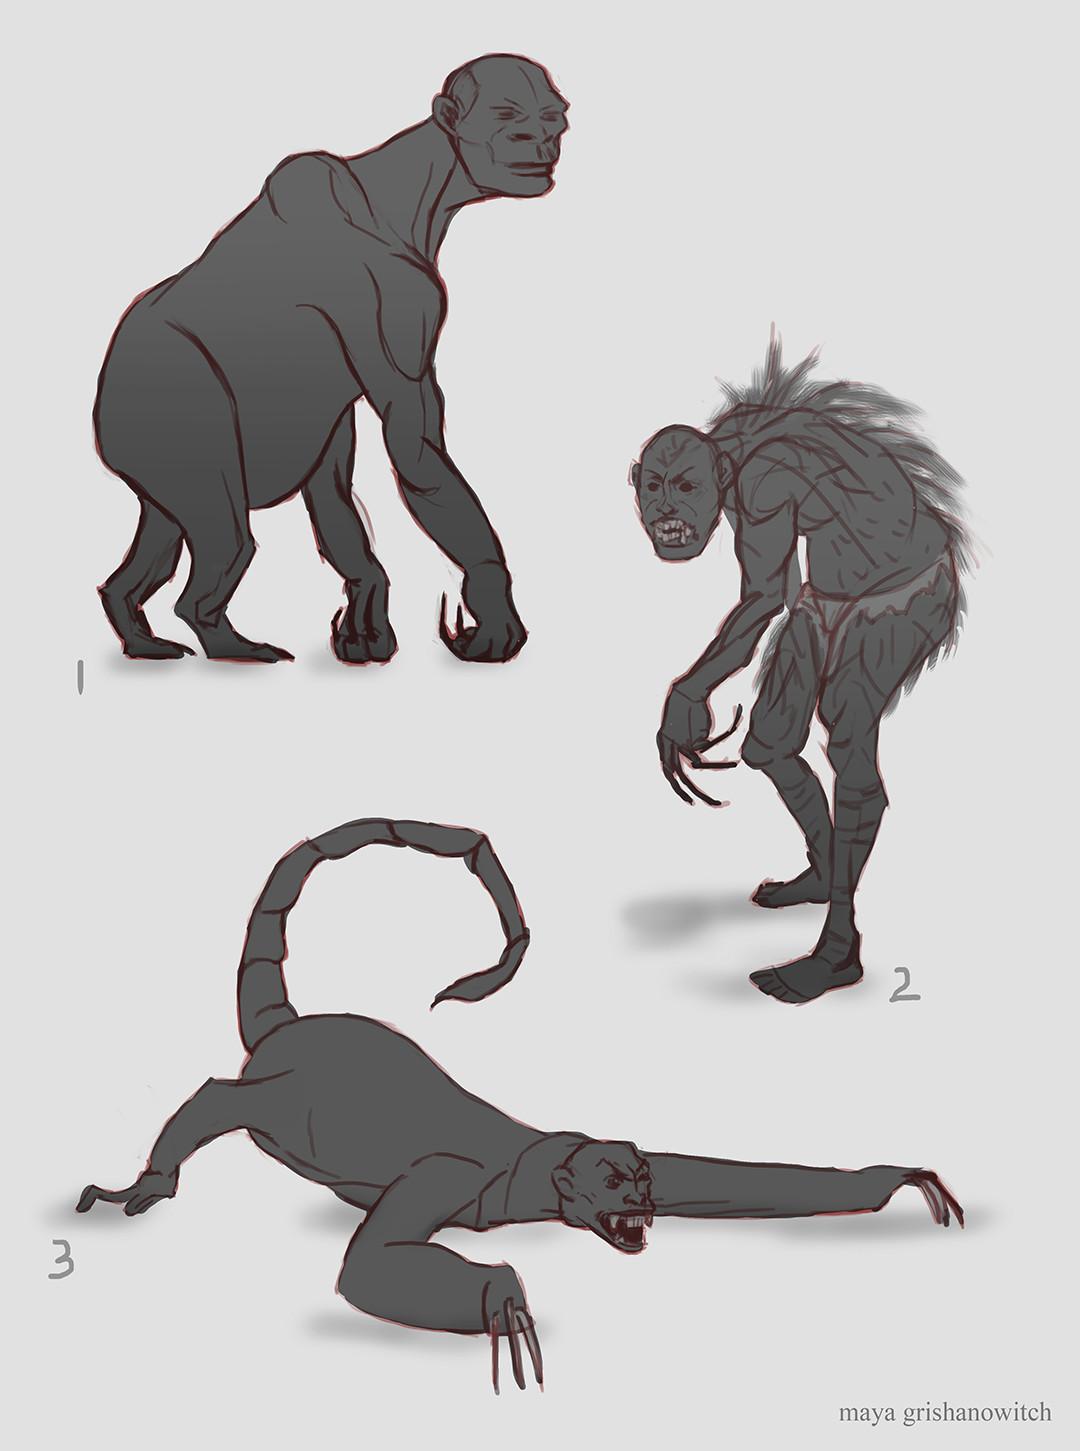 Maya grishanowitch draka kah bodyvariations